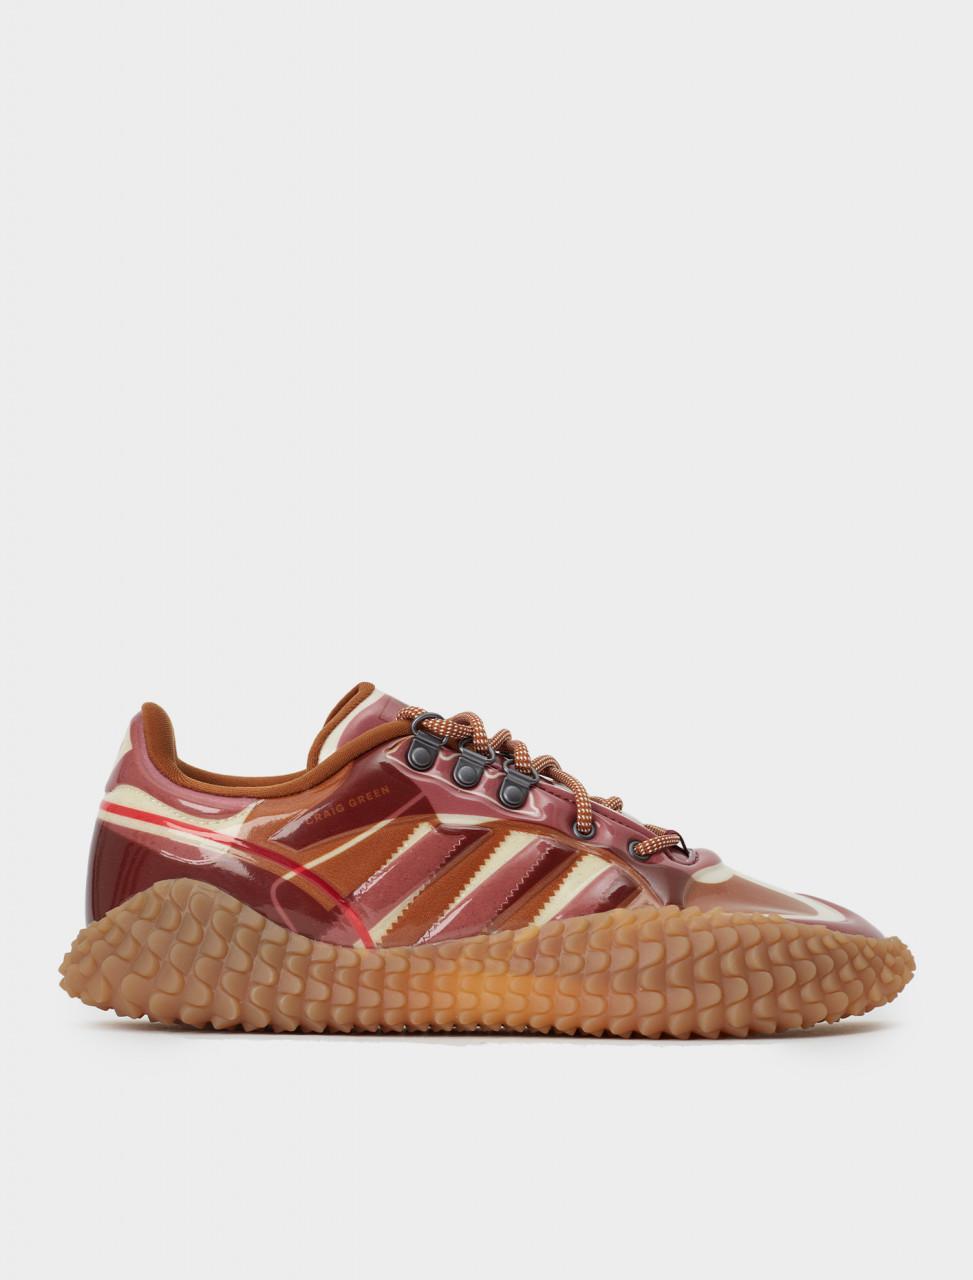 Adidas x Craig Green POLTA AKH I Sneaker in Brown